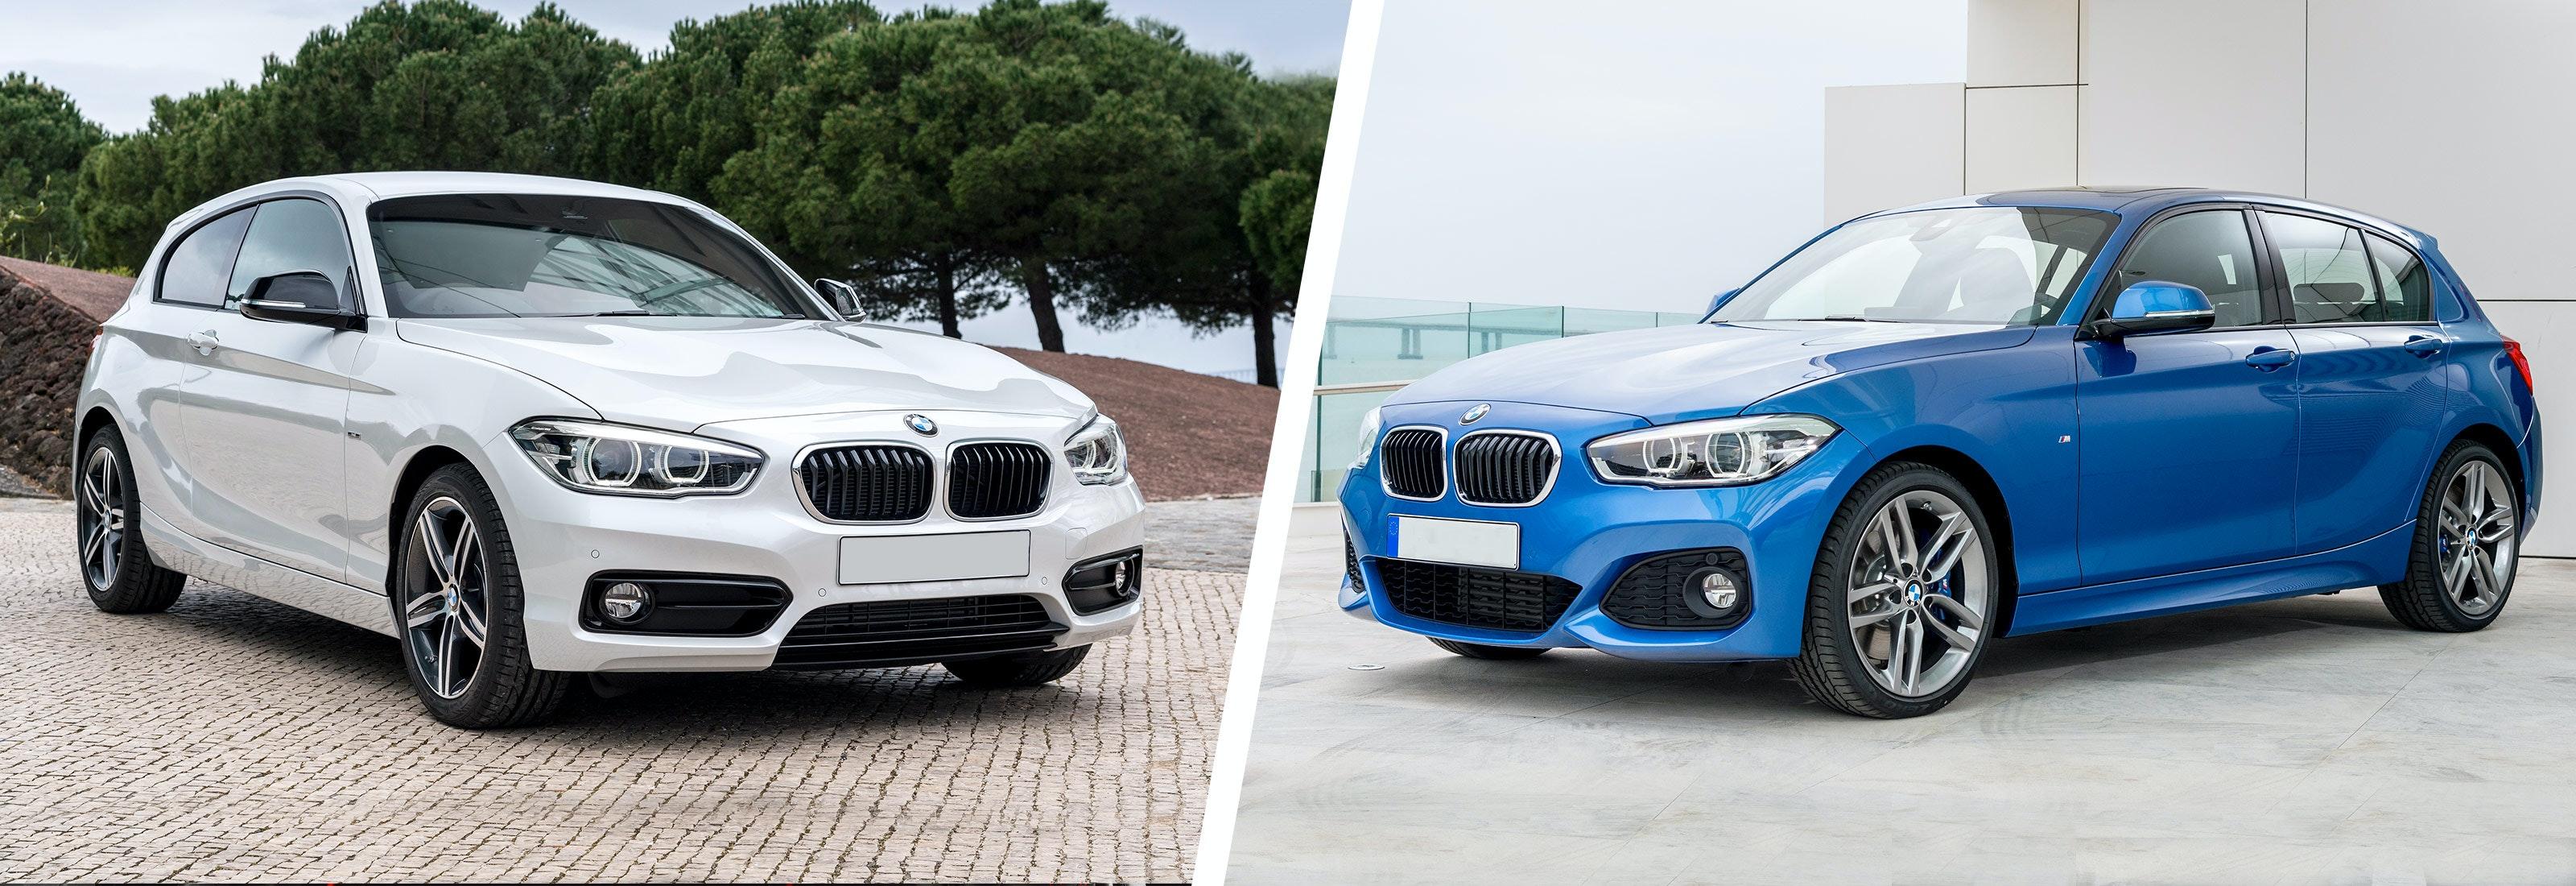 BMW 1 Series M Sport Vs Non M Sport Exterior